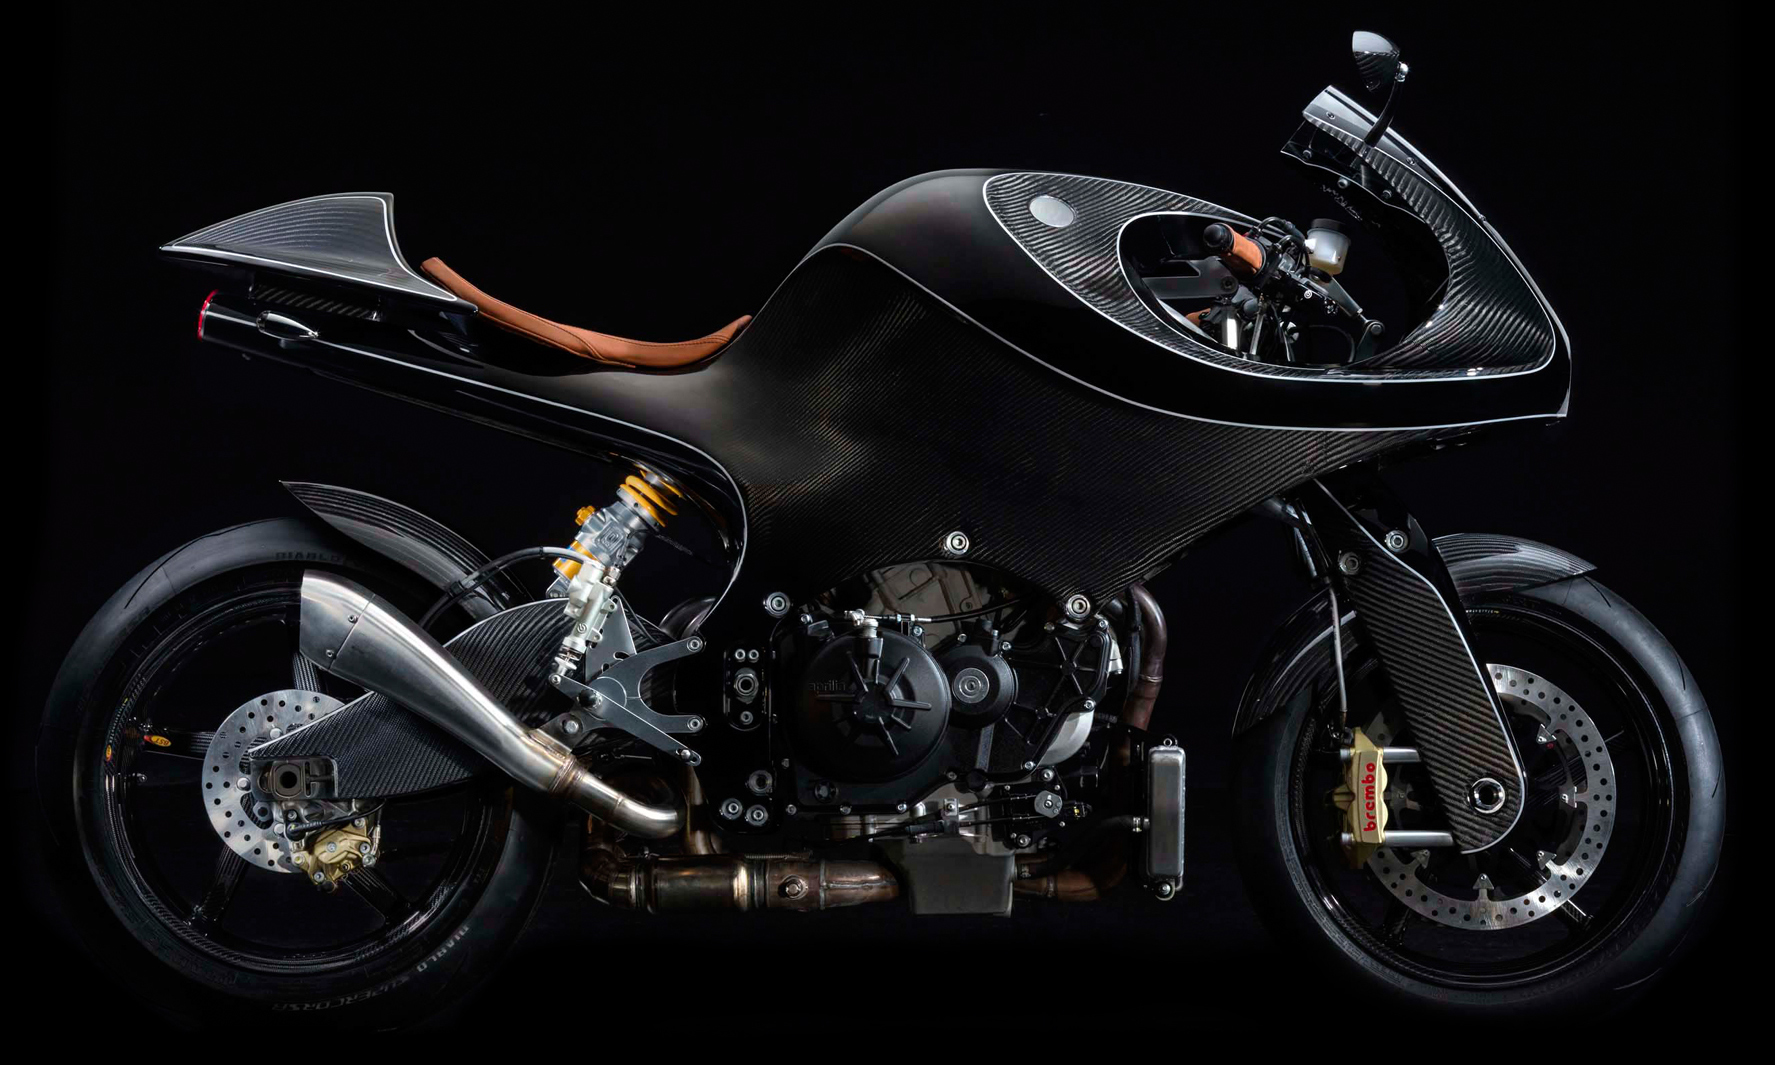 vanderheide-carbon-fiber-motorcycle-01